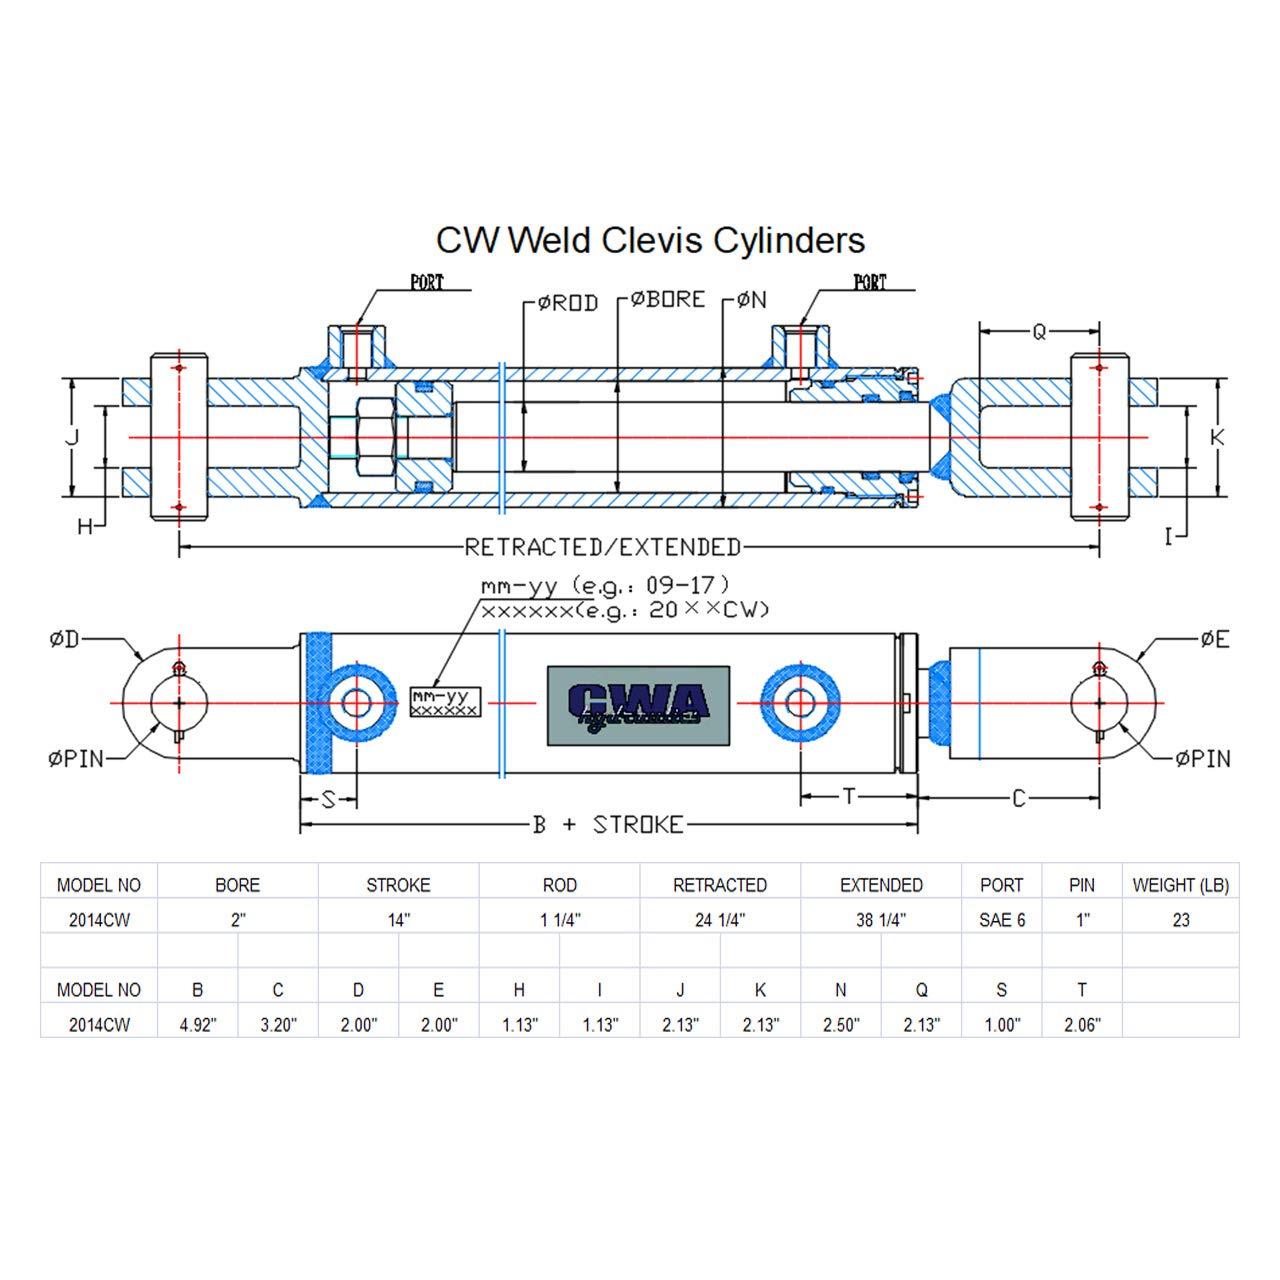 CWA Hydraulics CW Weld Clevis Hydraulic Cylinder 3 Bore x 8 Stroke x 1 1//2 Rod x SAE 8 Port x 3000 PSI